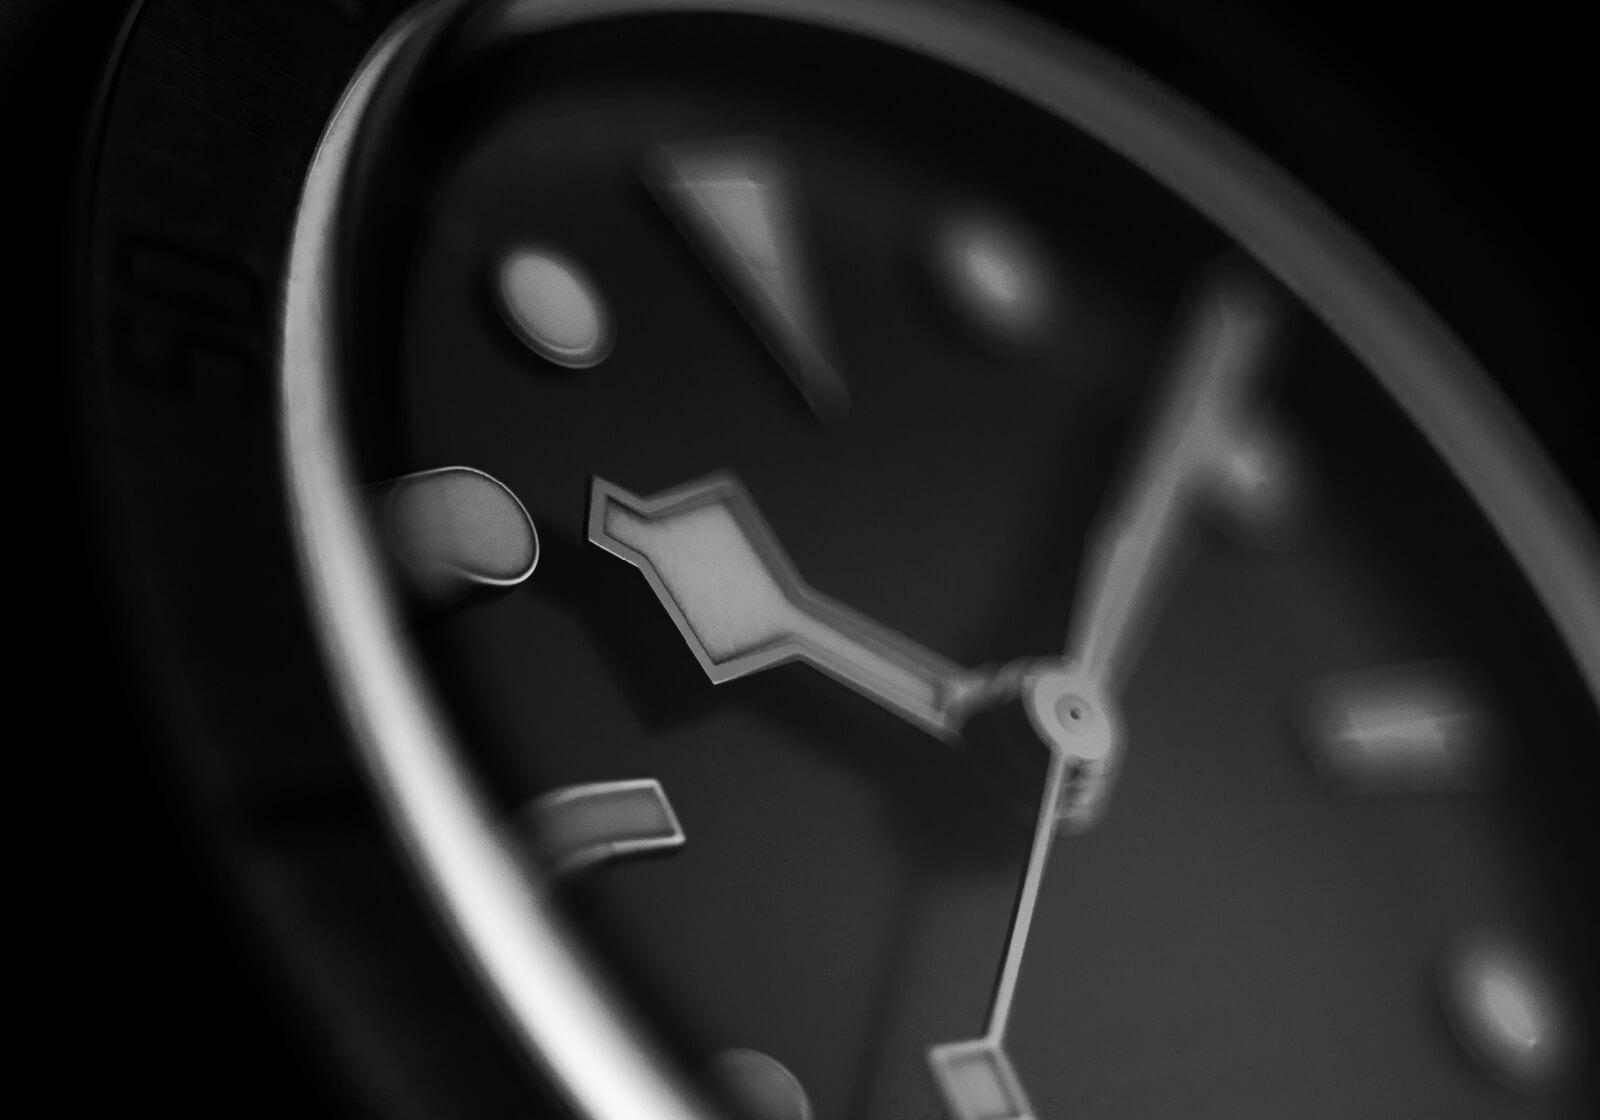 Pormenor mostrador Tudor Black Bay Ceramic | © Paulo Pires / Espiral do Tempo